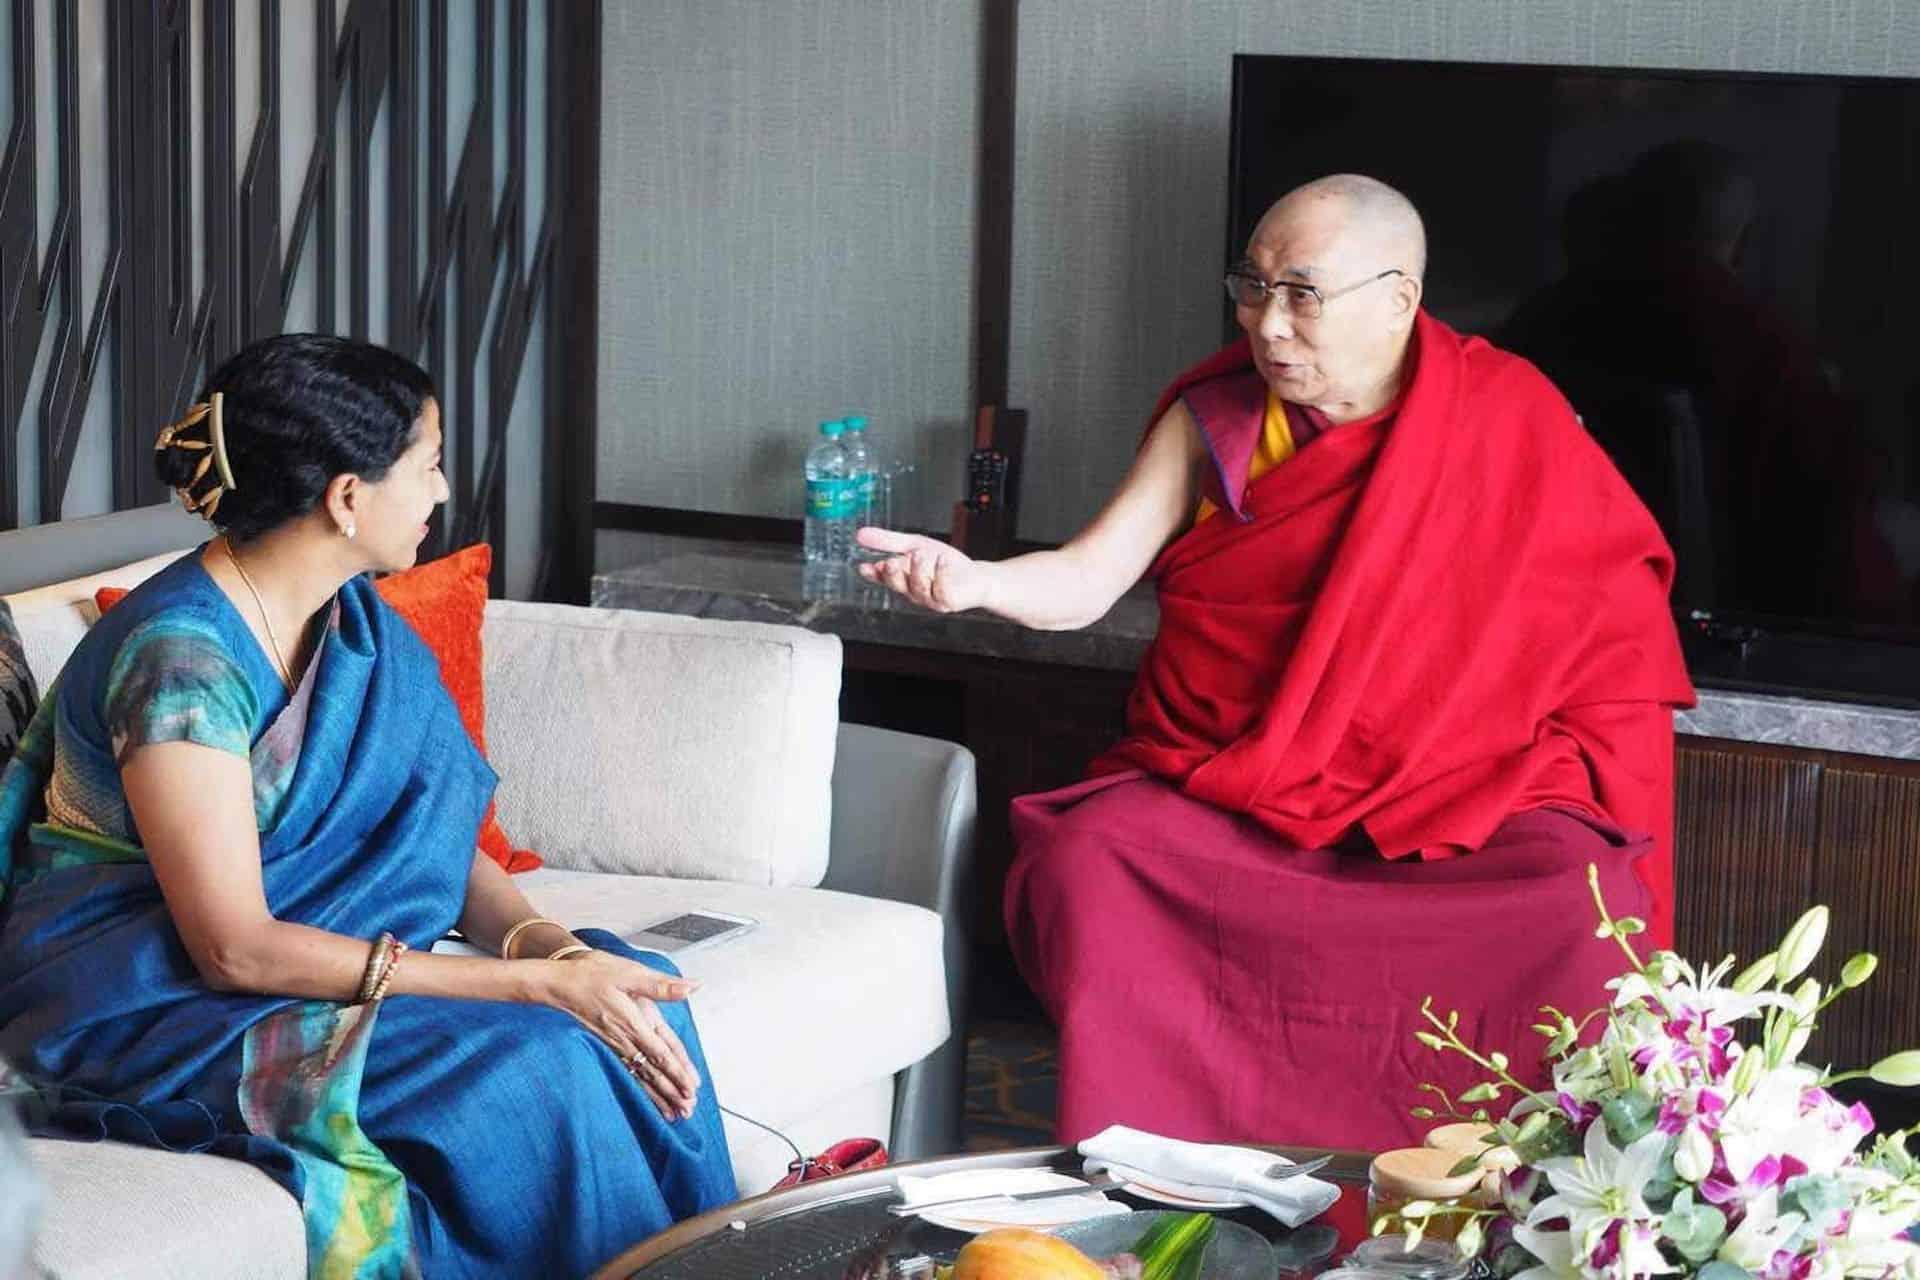 Shoba Narayan with The Dalai Lama